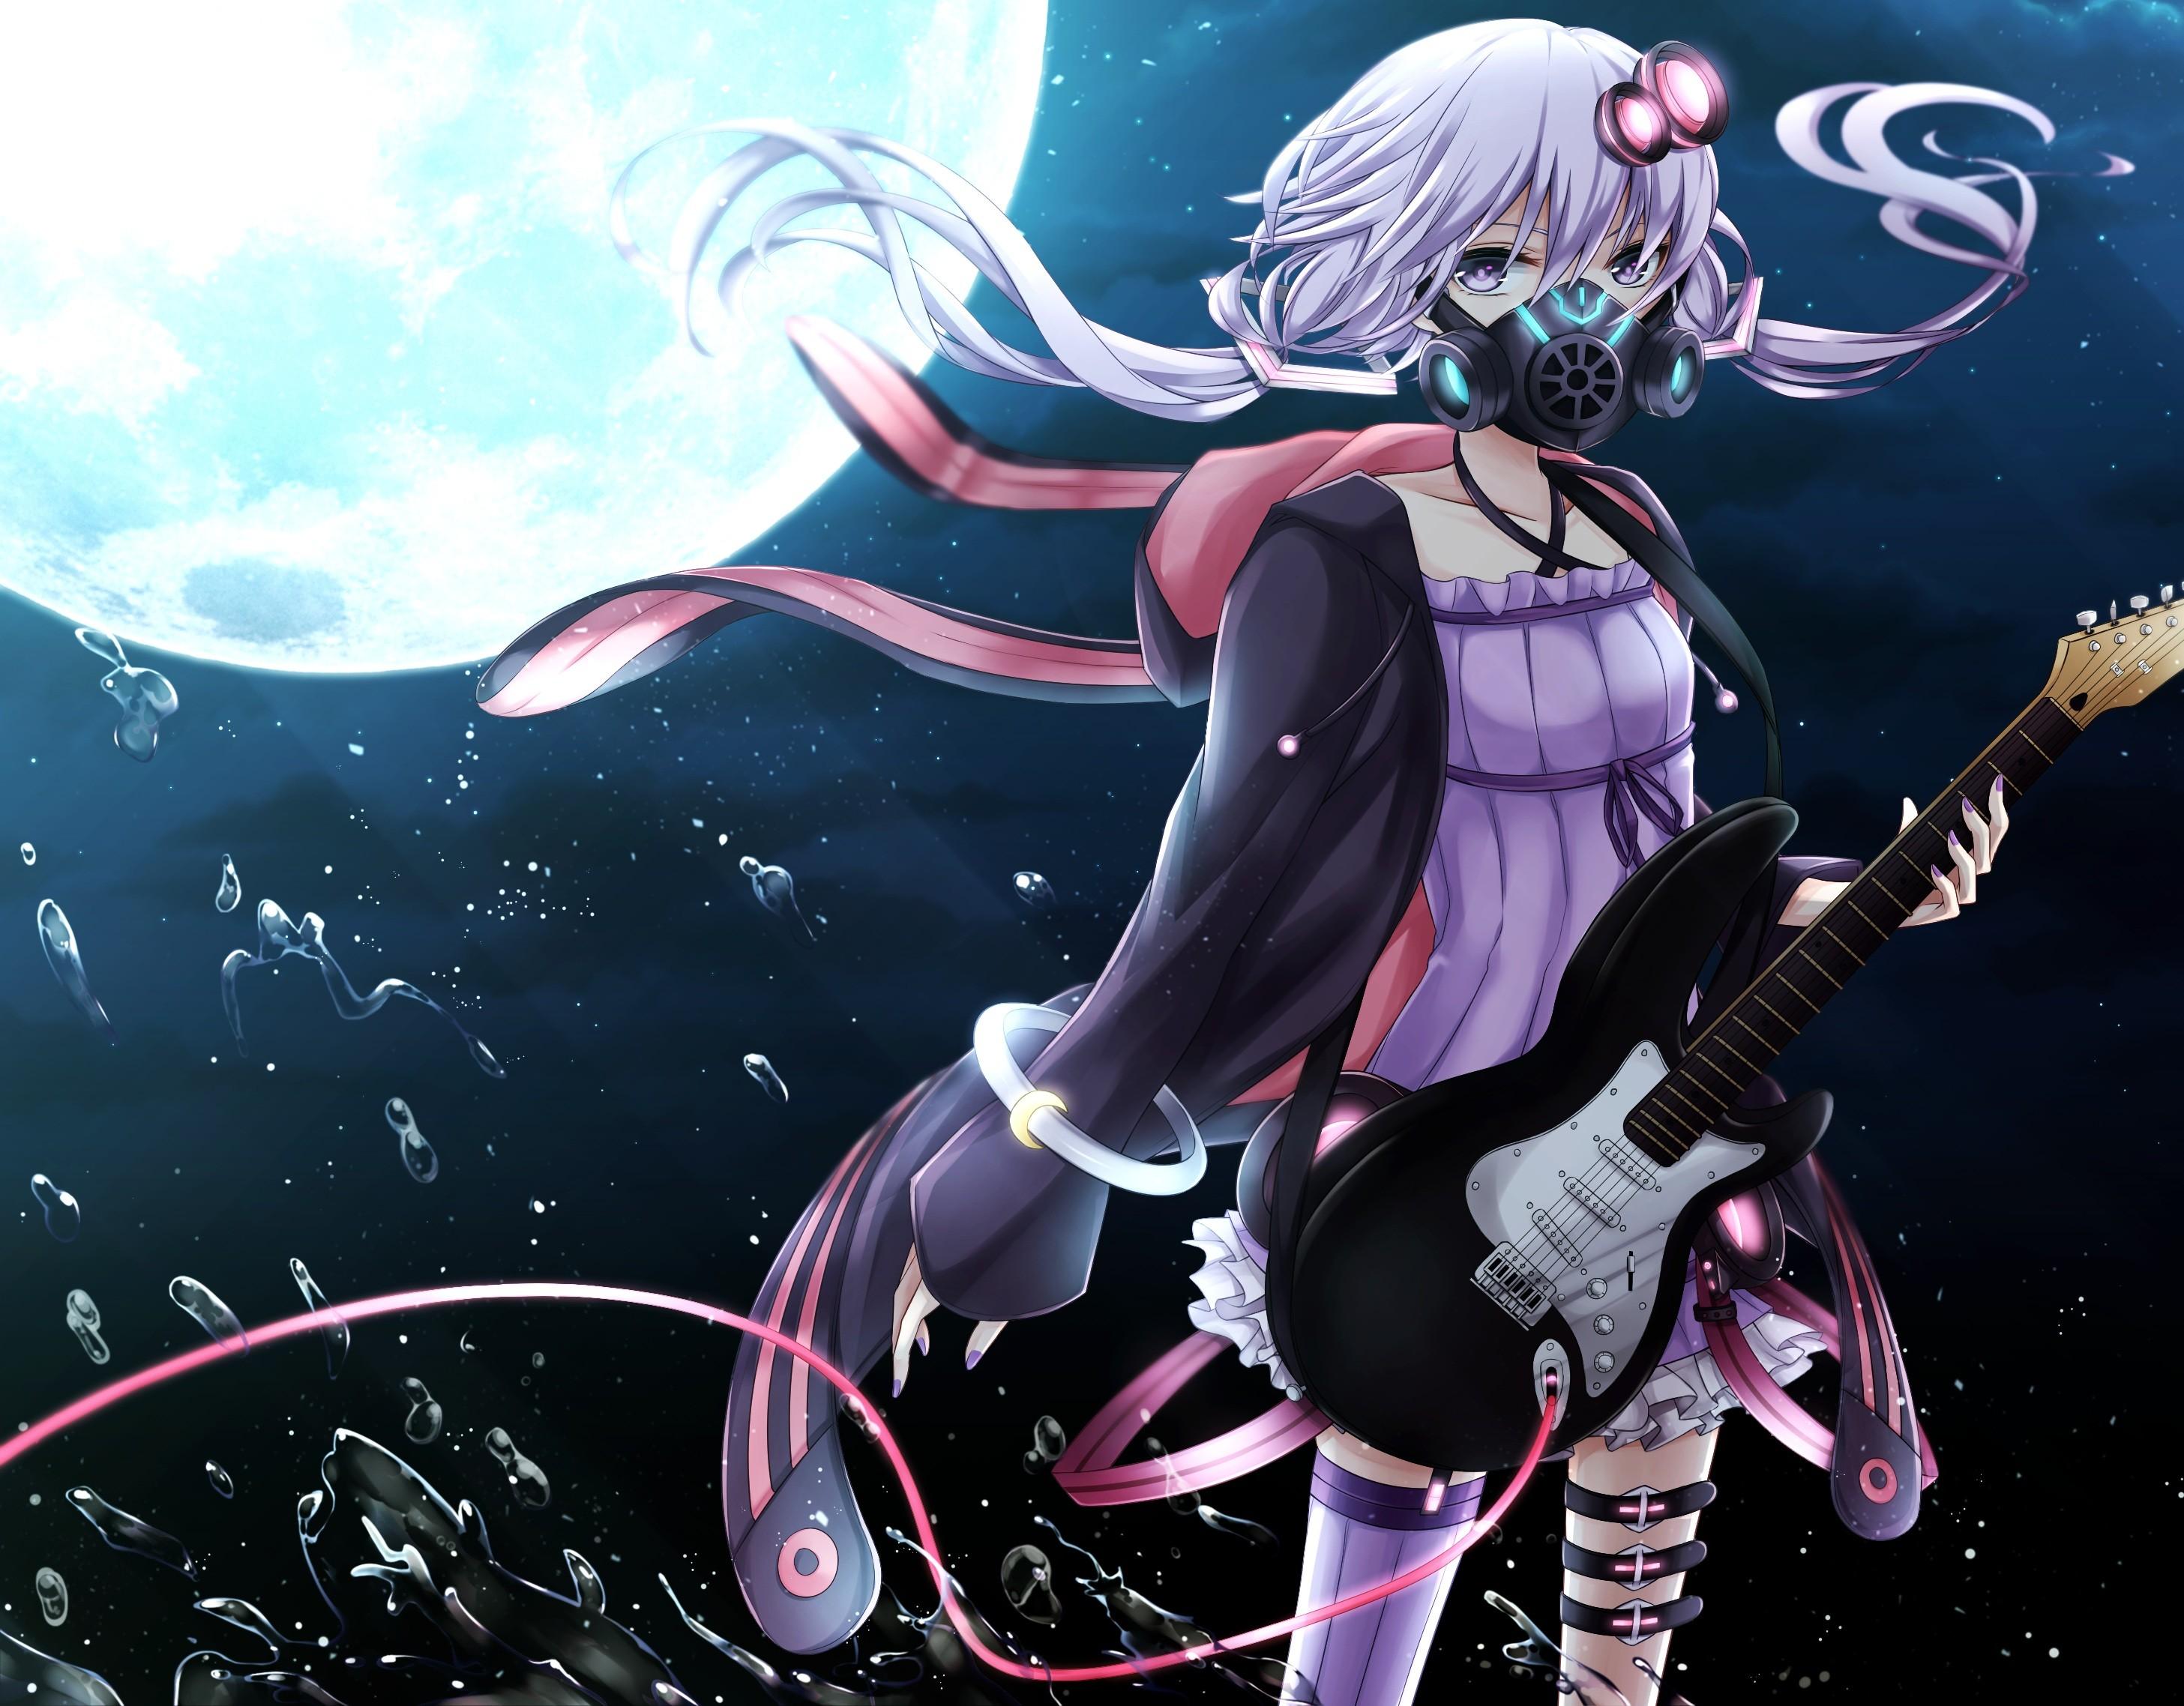 Anime 2913x2276 anime anime girls Vocaloid Yuzuki Yukari Moon